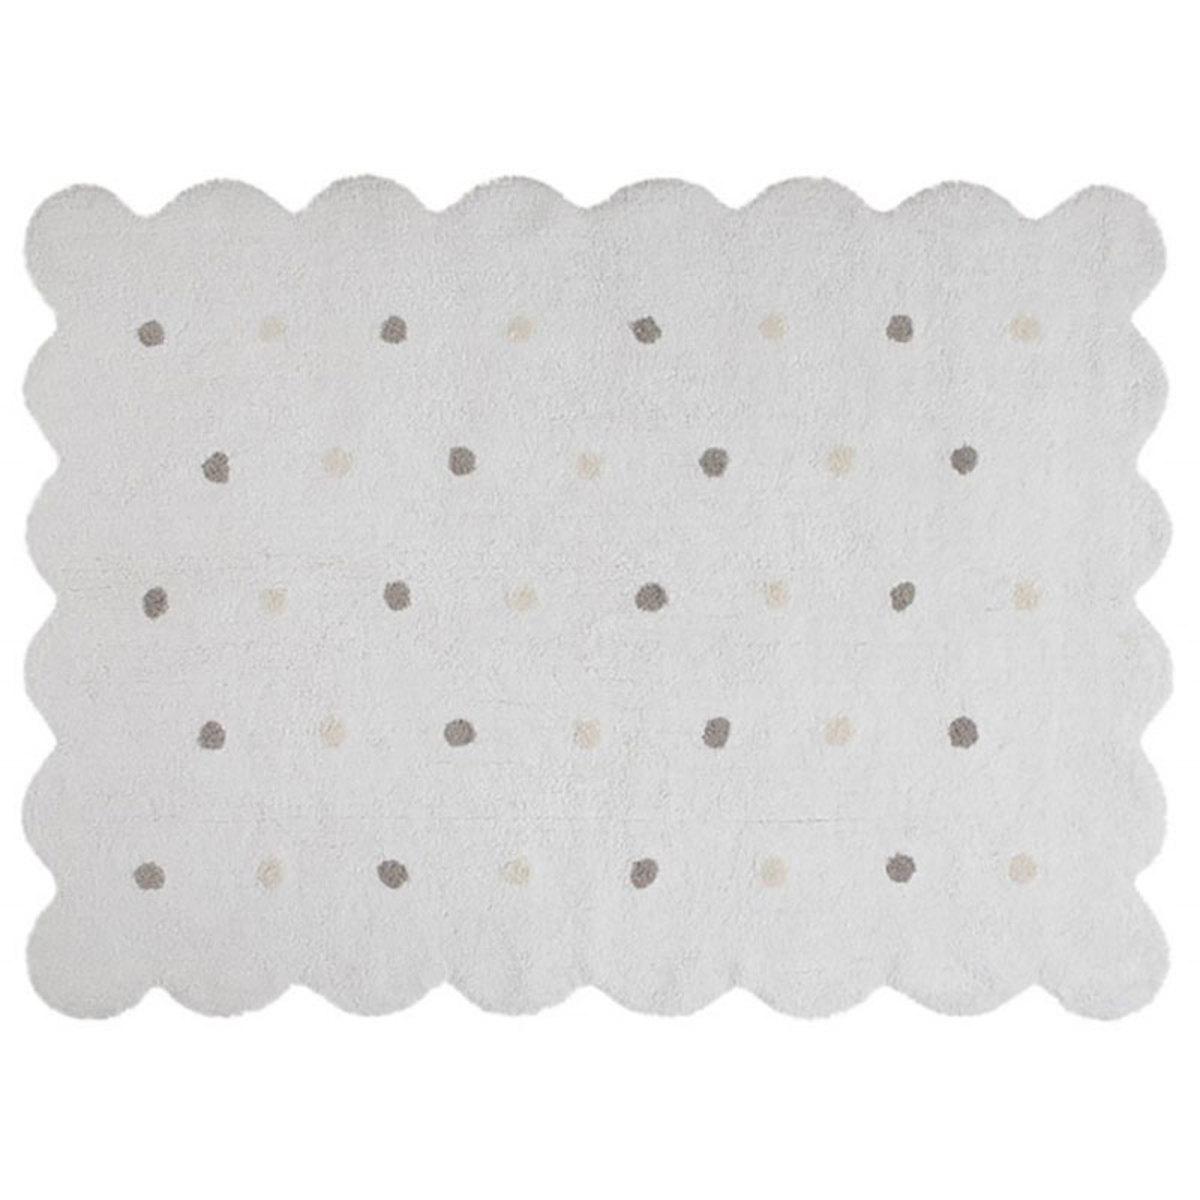 Tapis Tapis Lavable Biscuit Blanc - 120 x 160 cm Tapis Lavable Biscuit Blanc - 120 x 160 cm